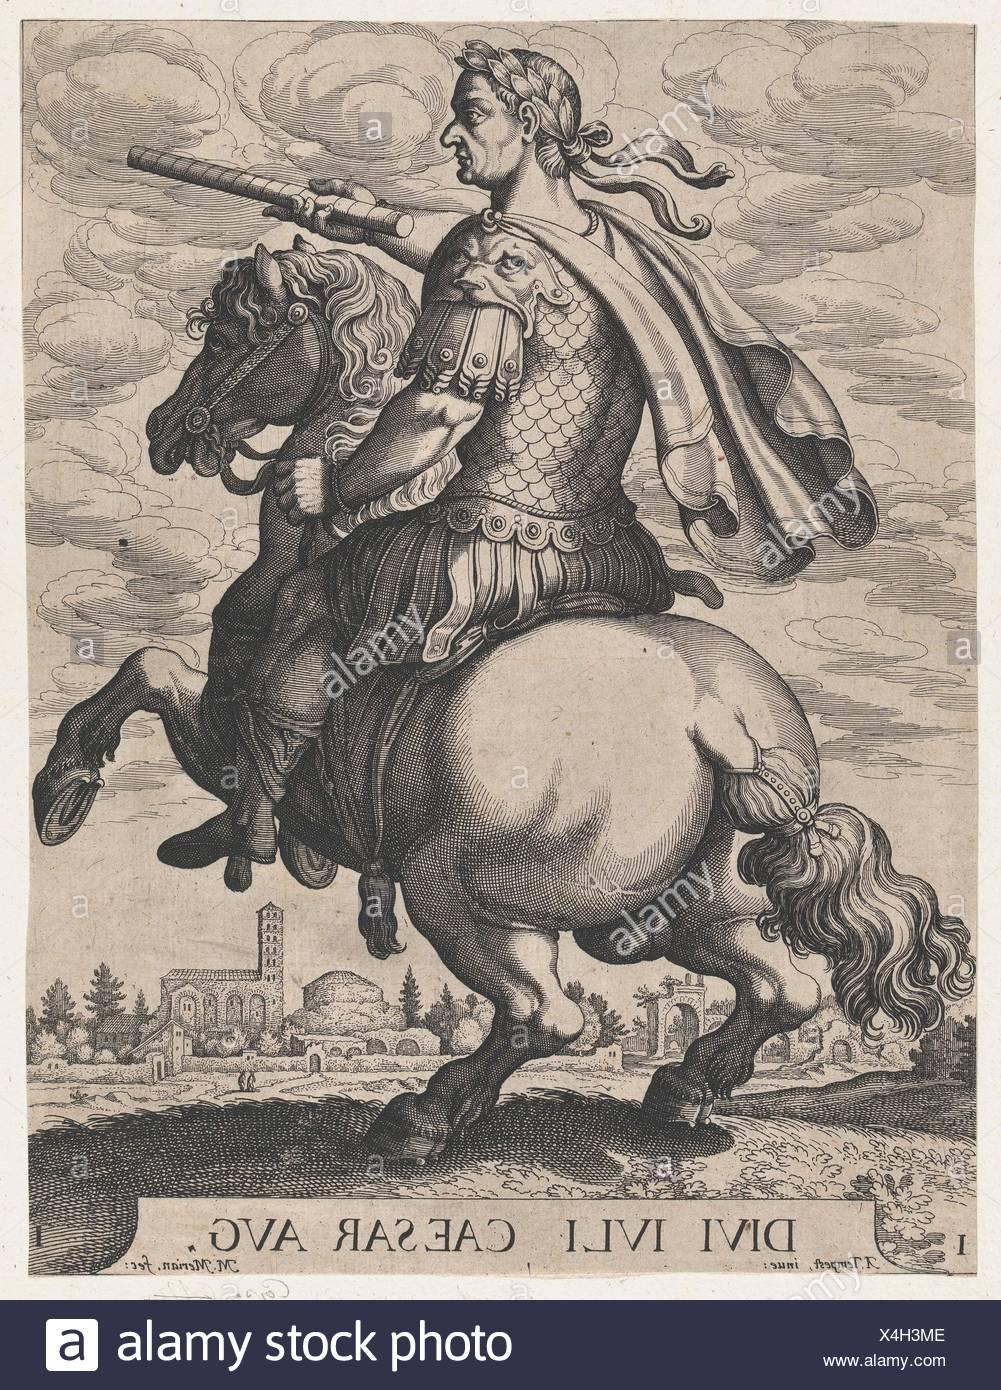 Plate 1: Emperor Julius Caesar on Horseback, from ´ The First Twelve Roman Caesars´, after Tempesta. Artist: Matthäus Merian the Elder (Swiss, Basel Stock Photo